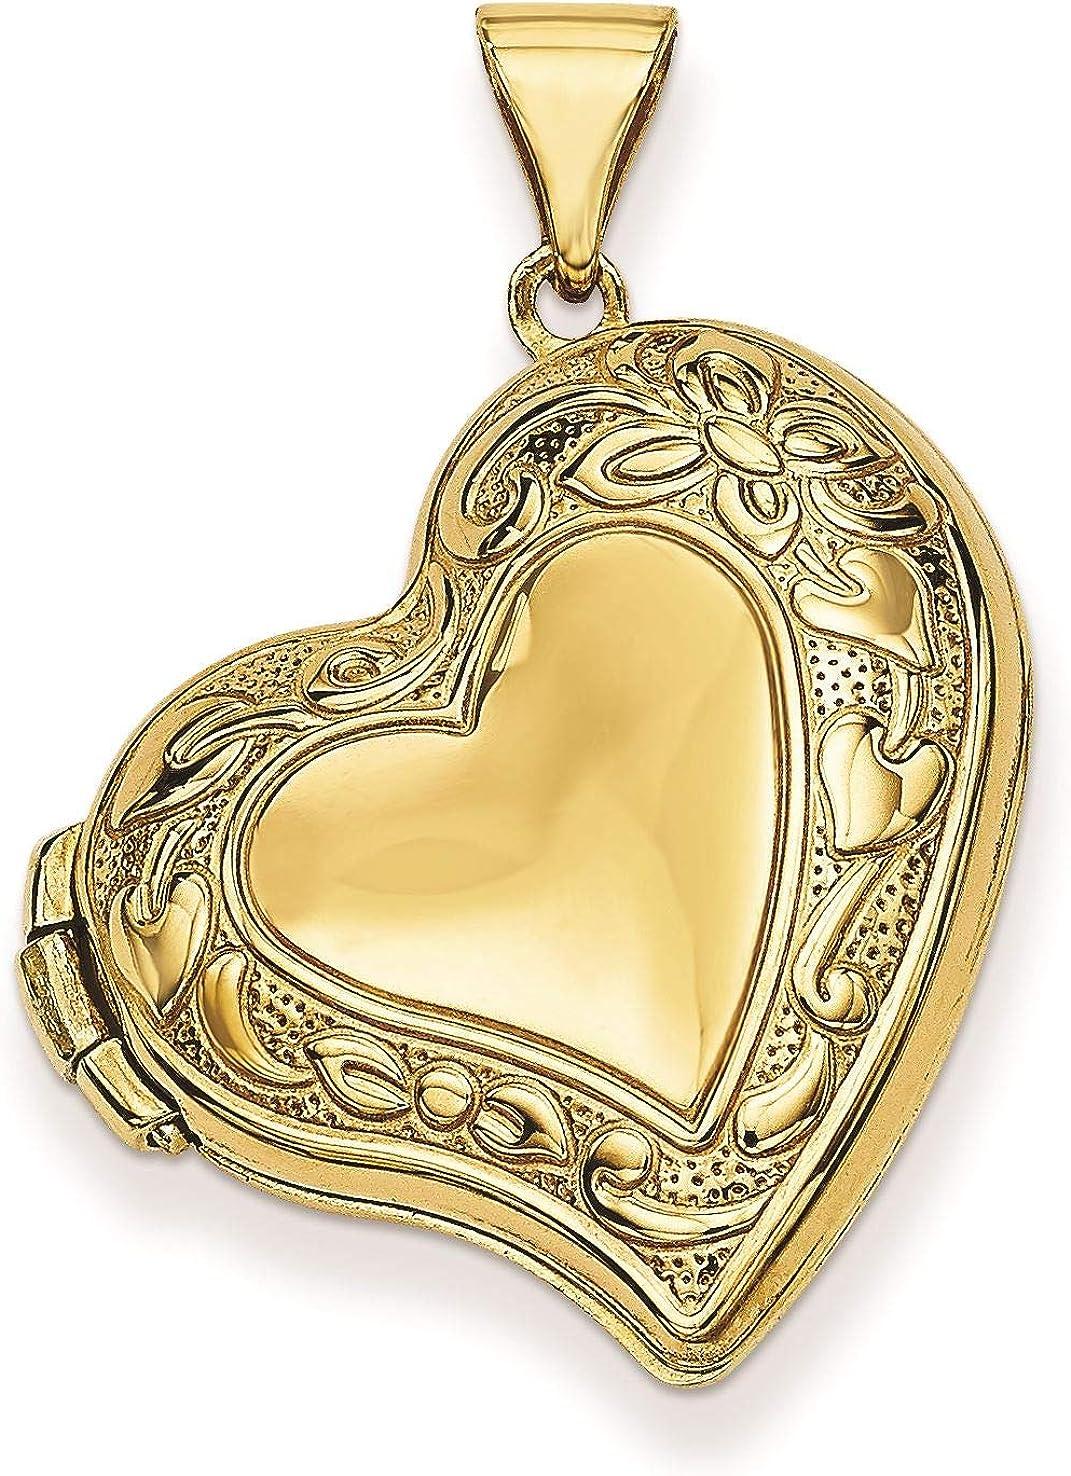 NFL Pittsburgh Steelers Slanted Heart Necklace DiamondJewelryNY Pittsburgh Steelers Pendant